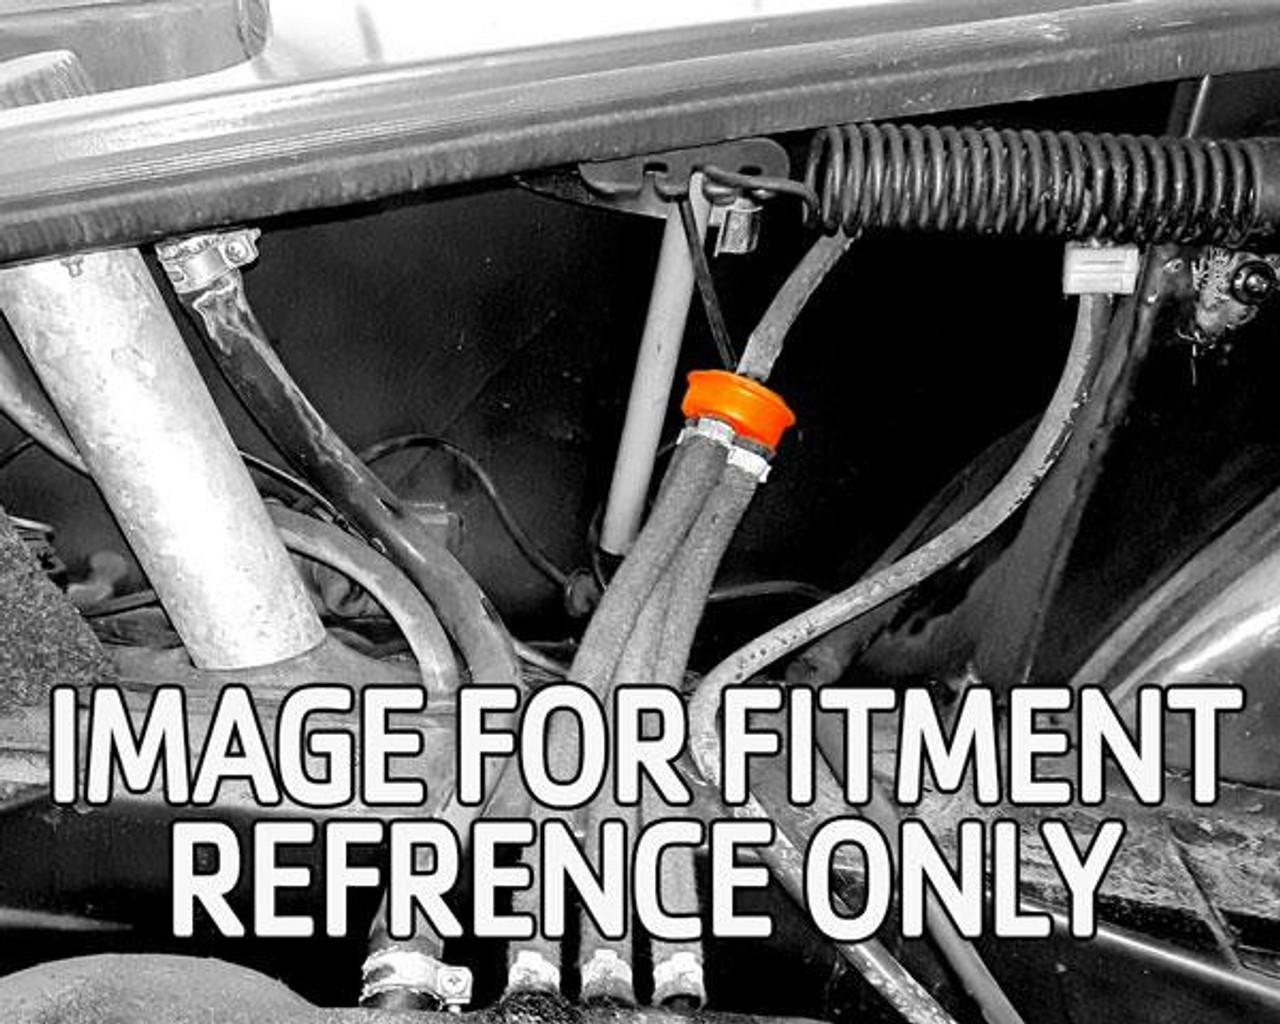 Fuel or gas vapor 3 to 1 union - FIAT 124 1978-85